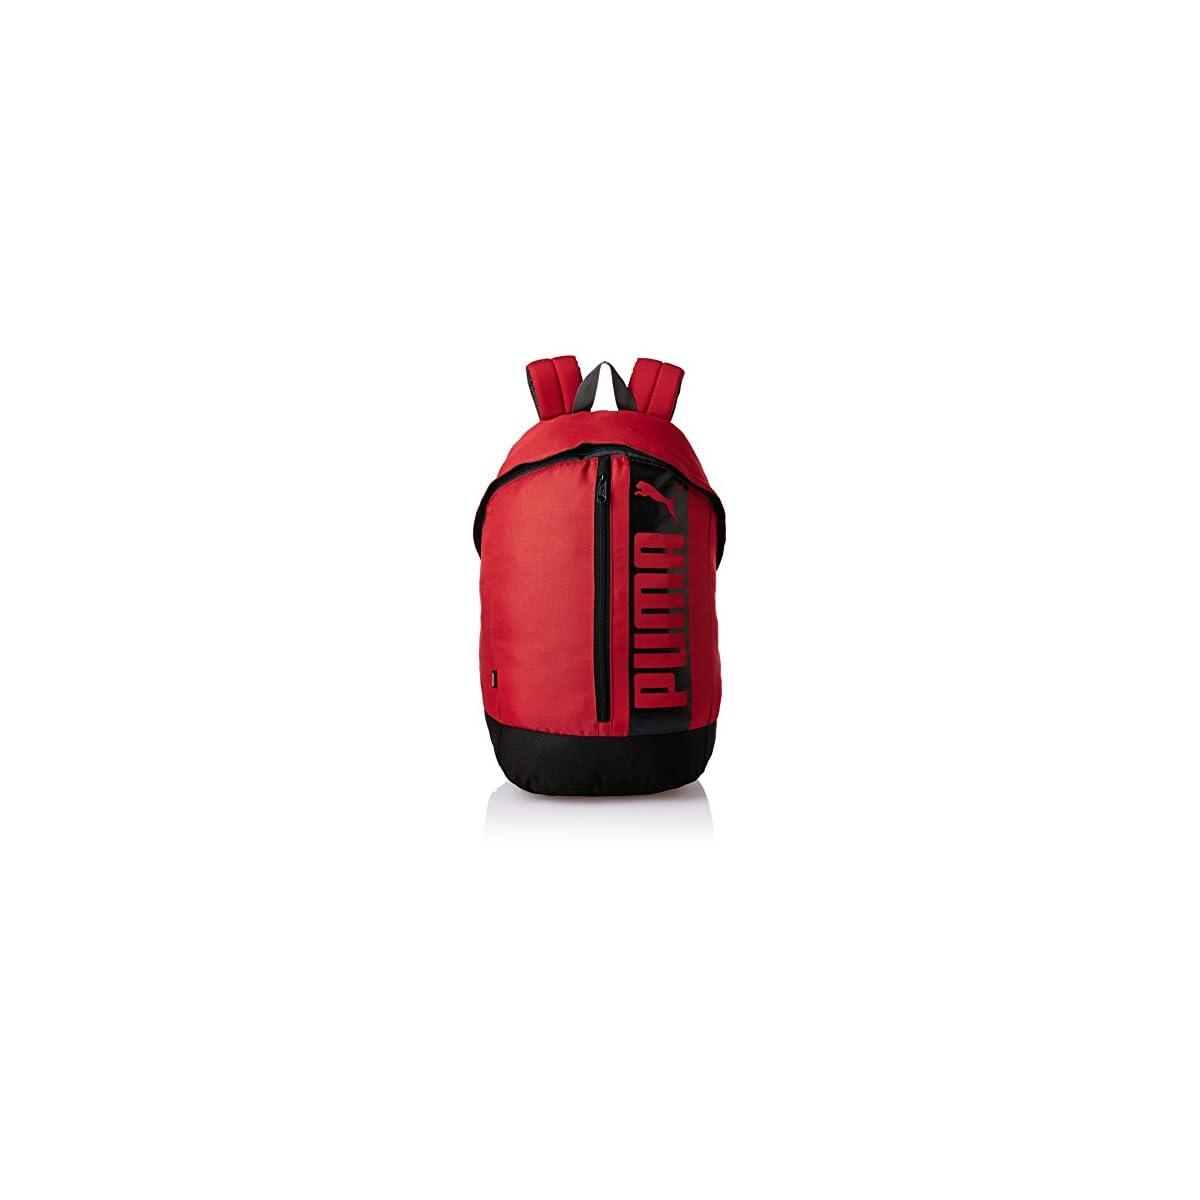 41BvVxp8DwL. SS1200  - Puma Pioneer Backpack II-Mochila